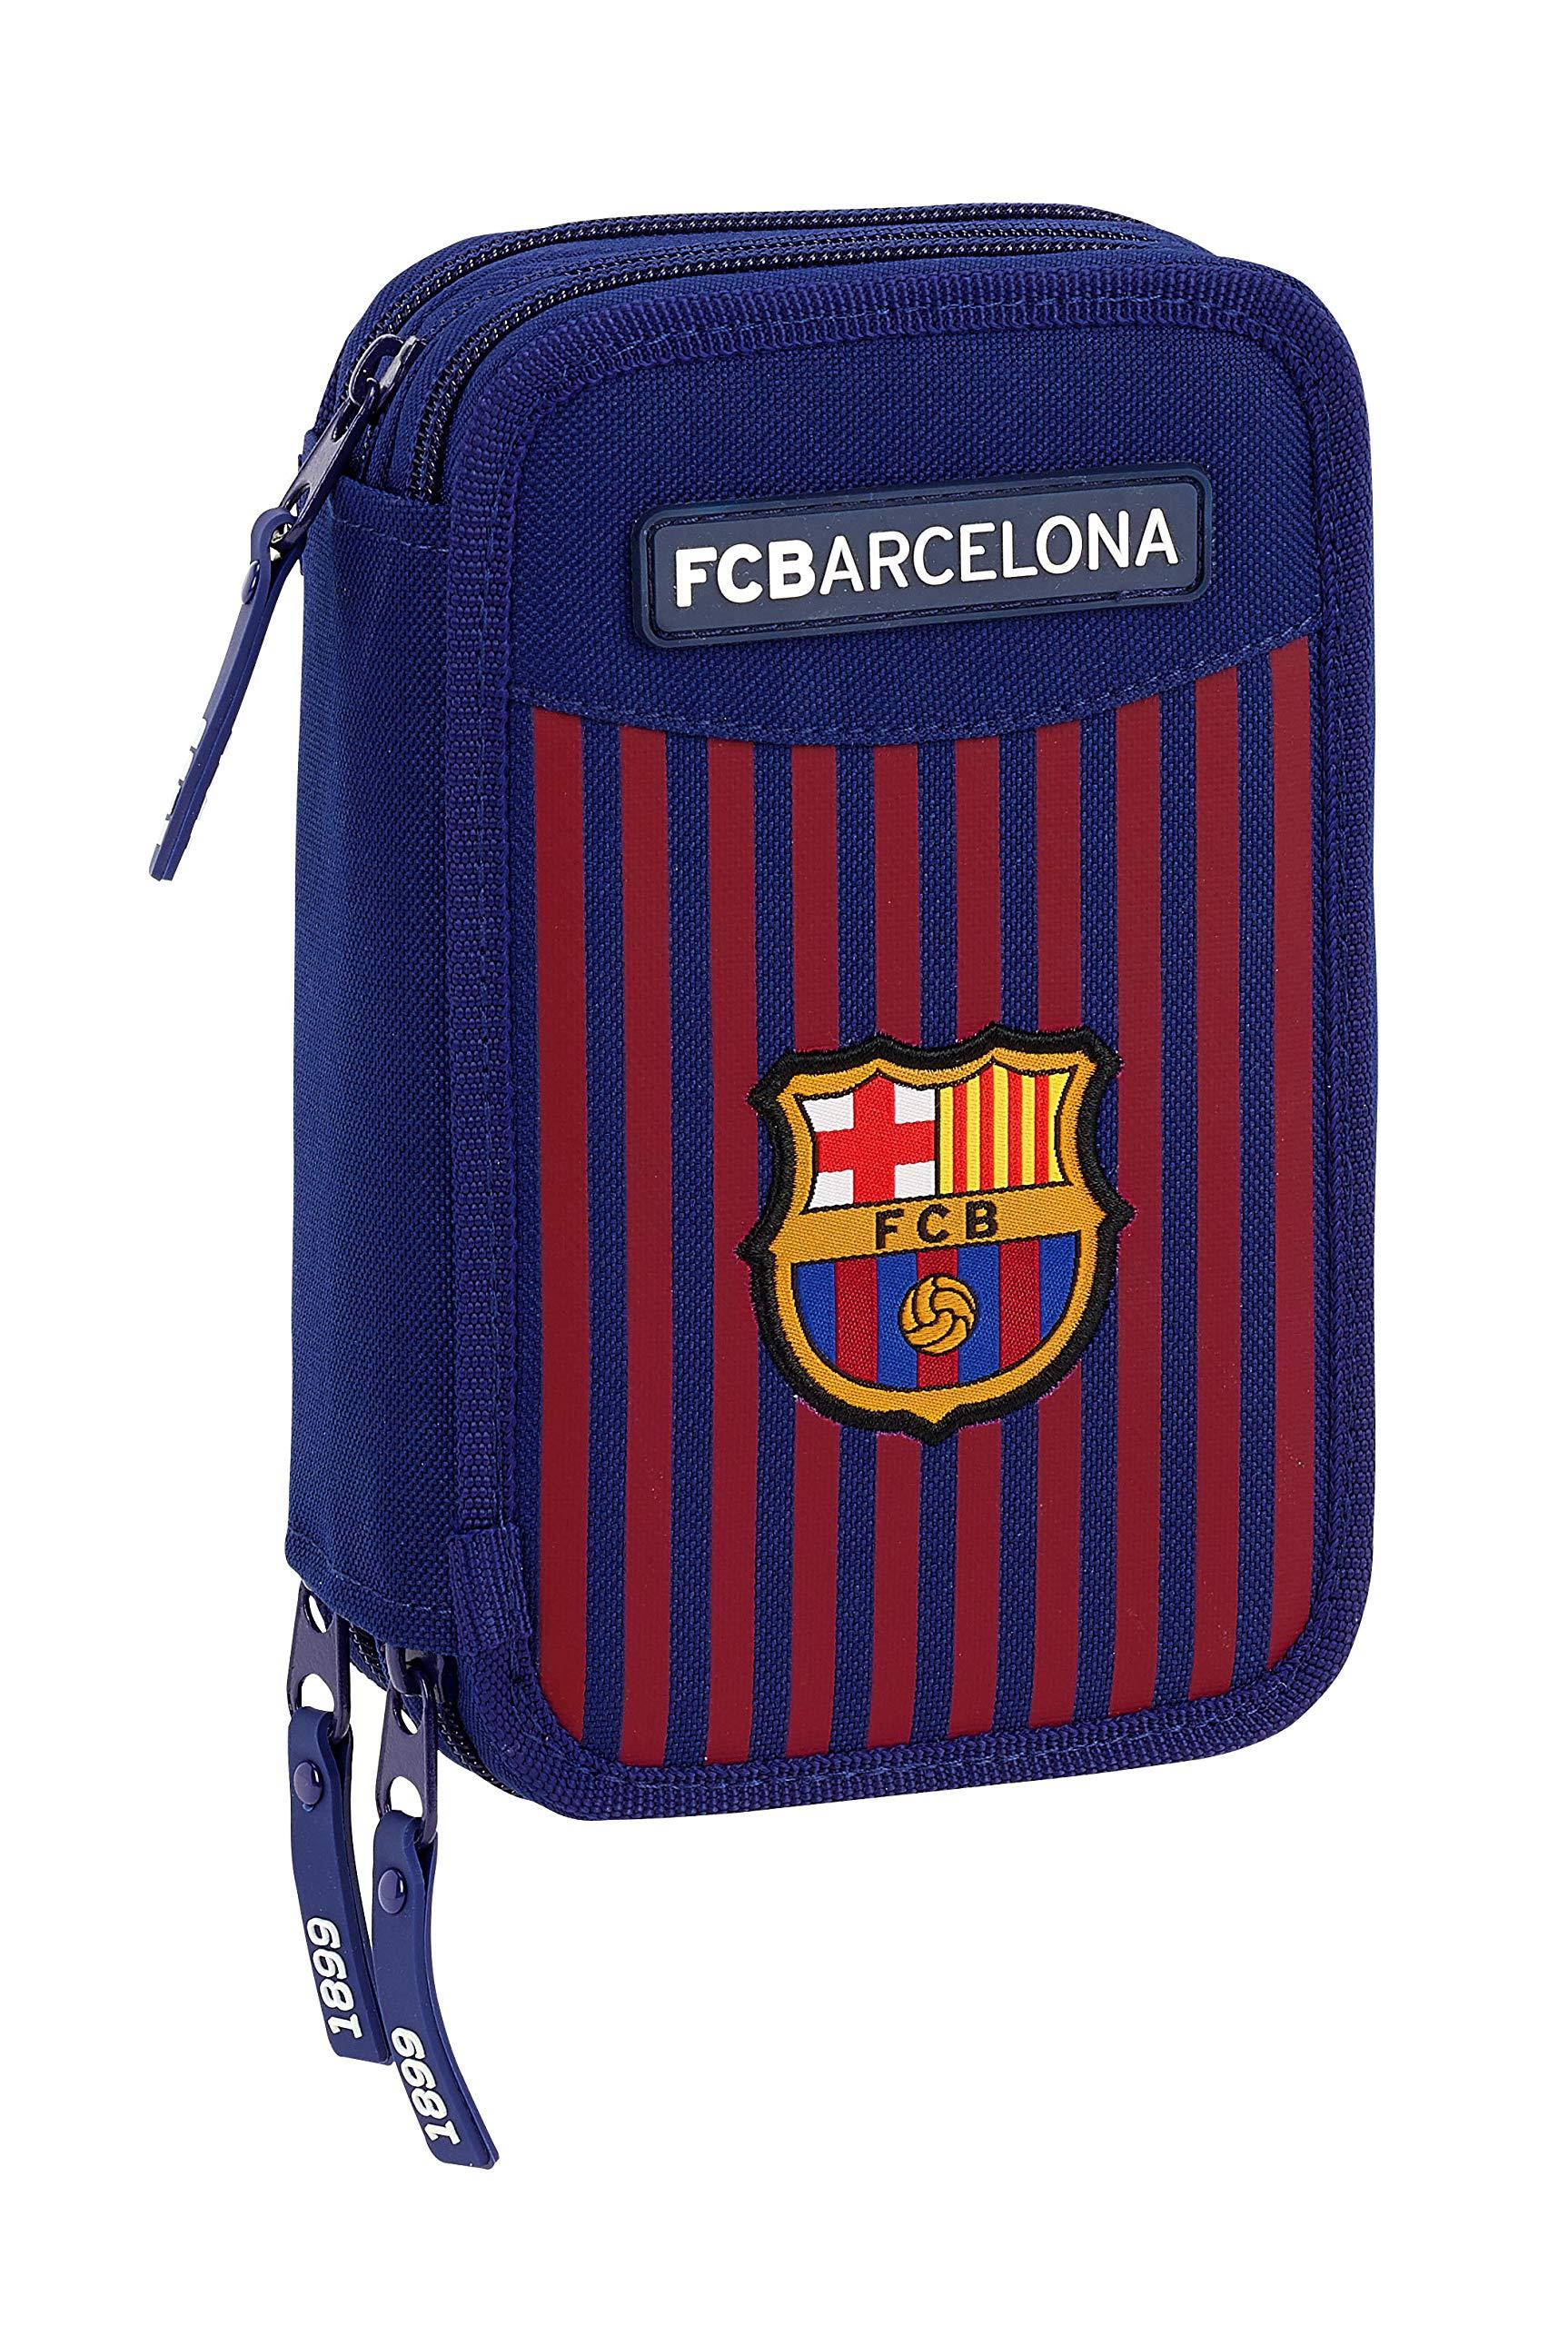 FC Barcelona 411829057 2018 Estuches, 20 cm, Azul